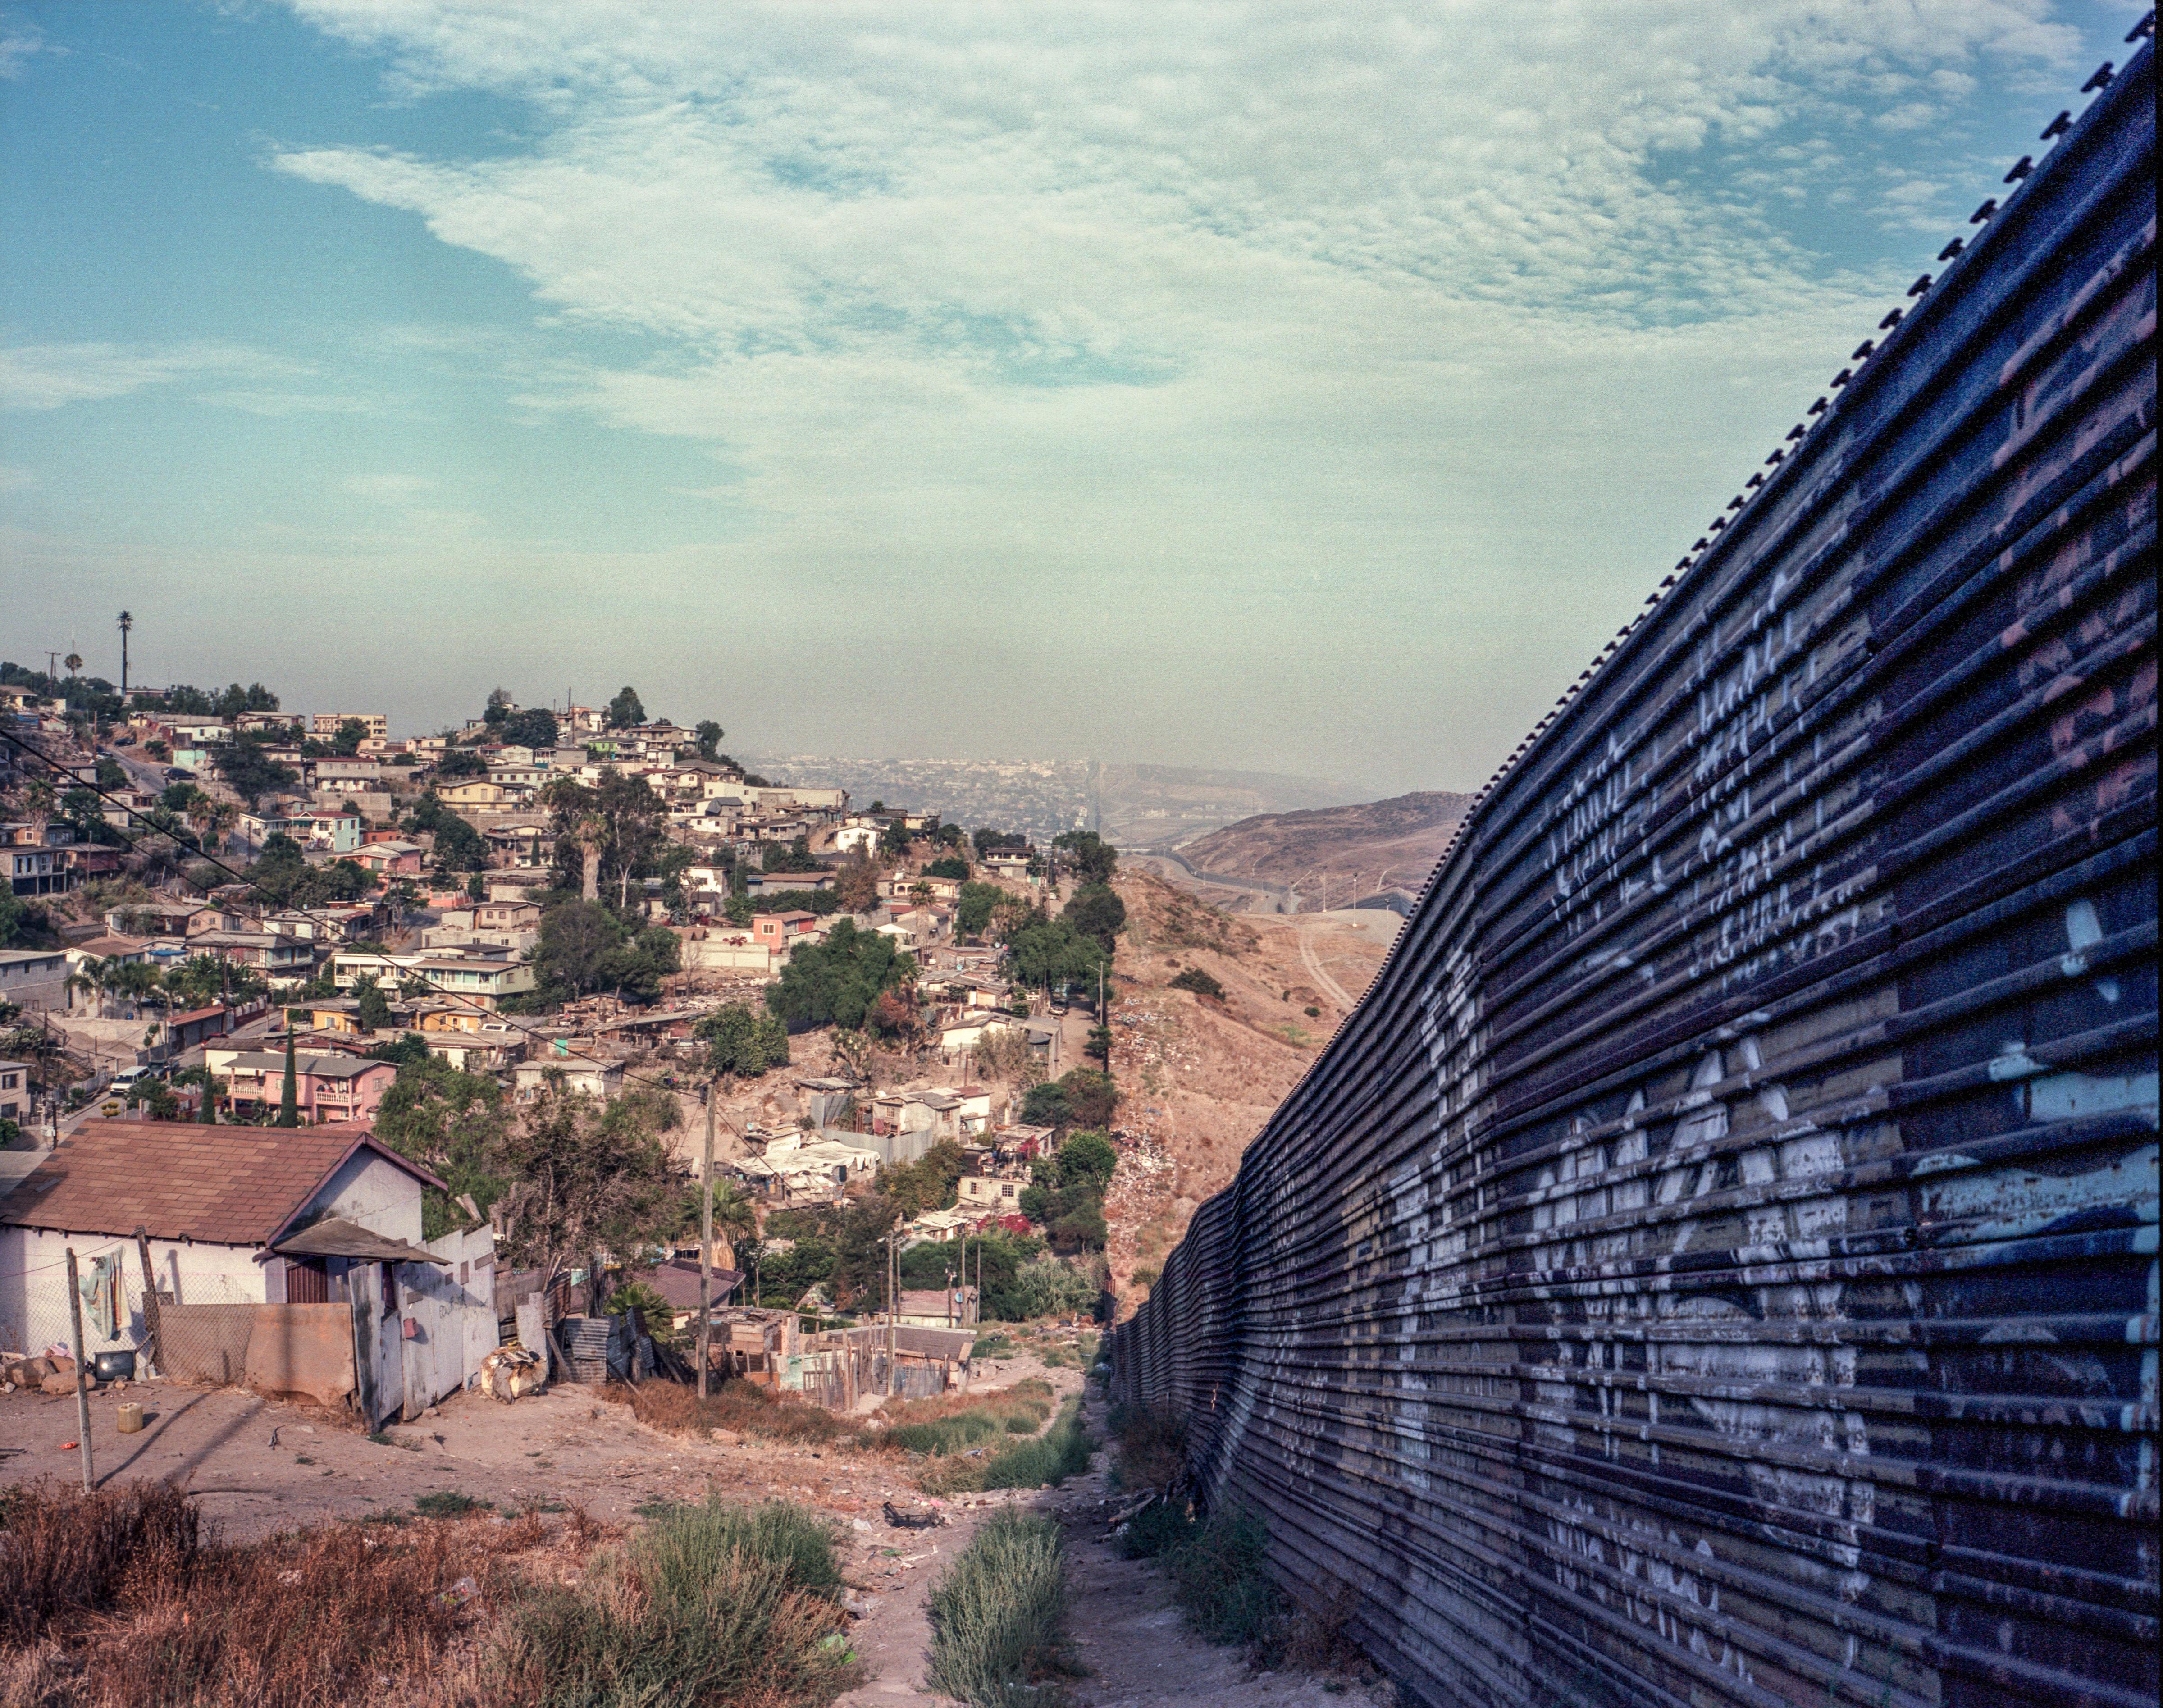 U.S.-Mexico border at Tijuana and San Ysidro